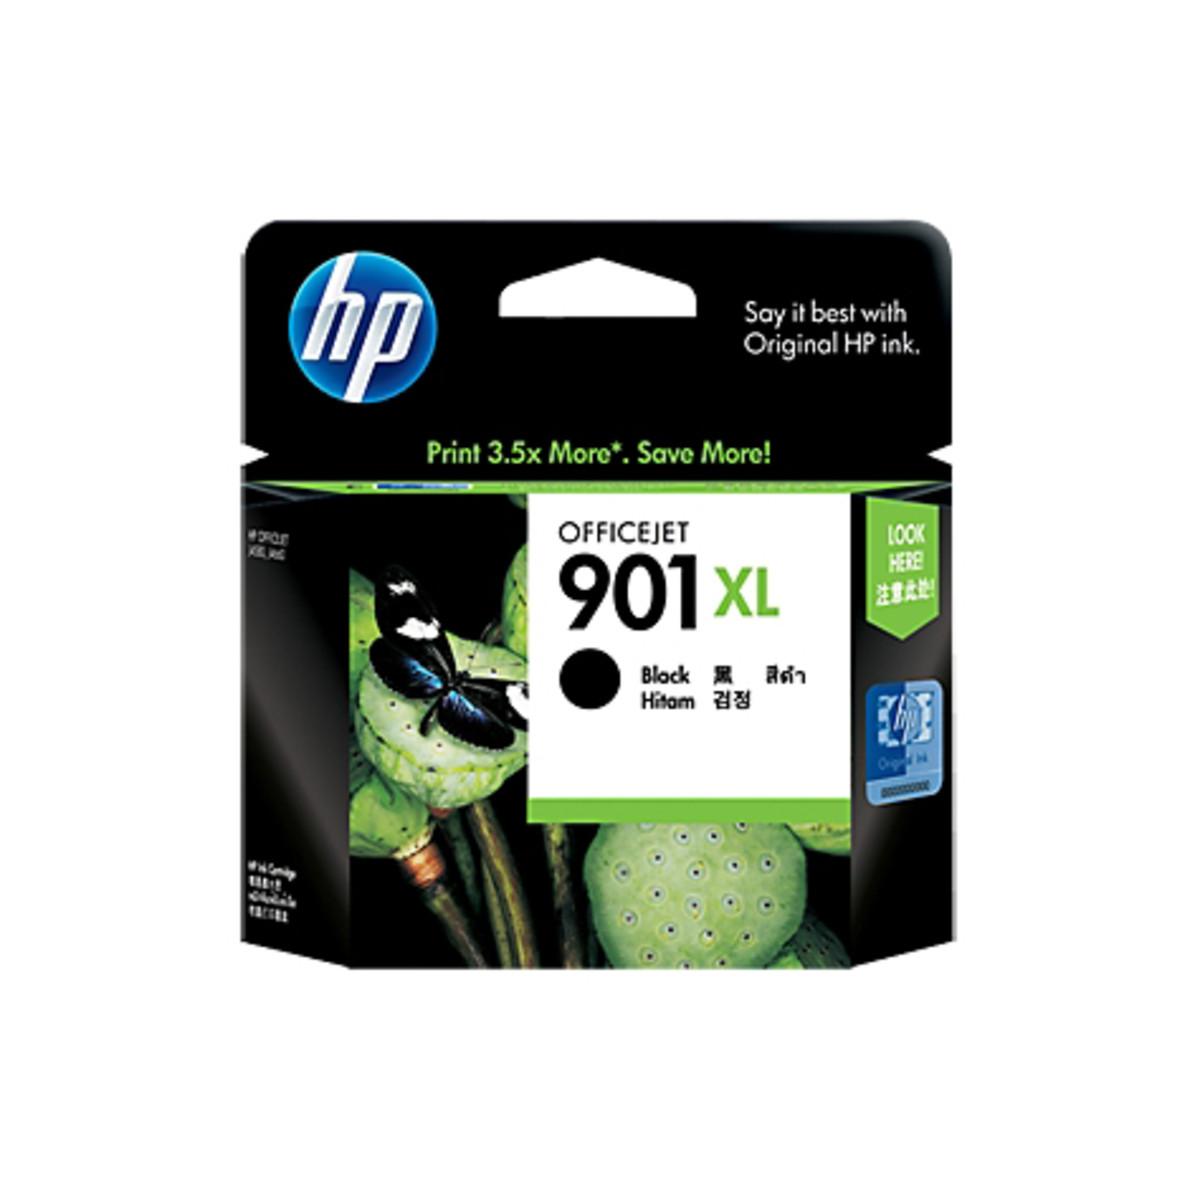 HP 901XL (CC654AA) Black Ink Cartridge - High Yield